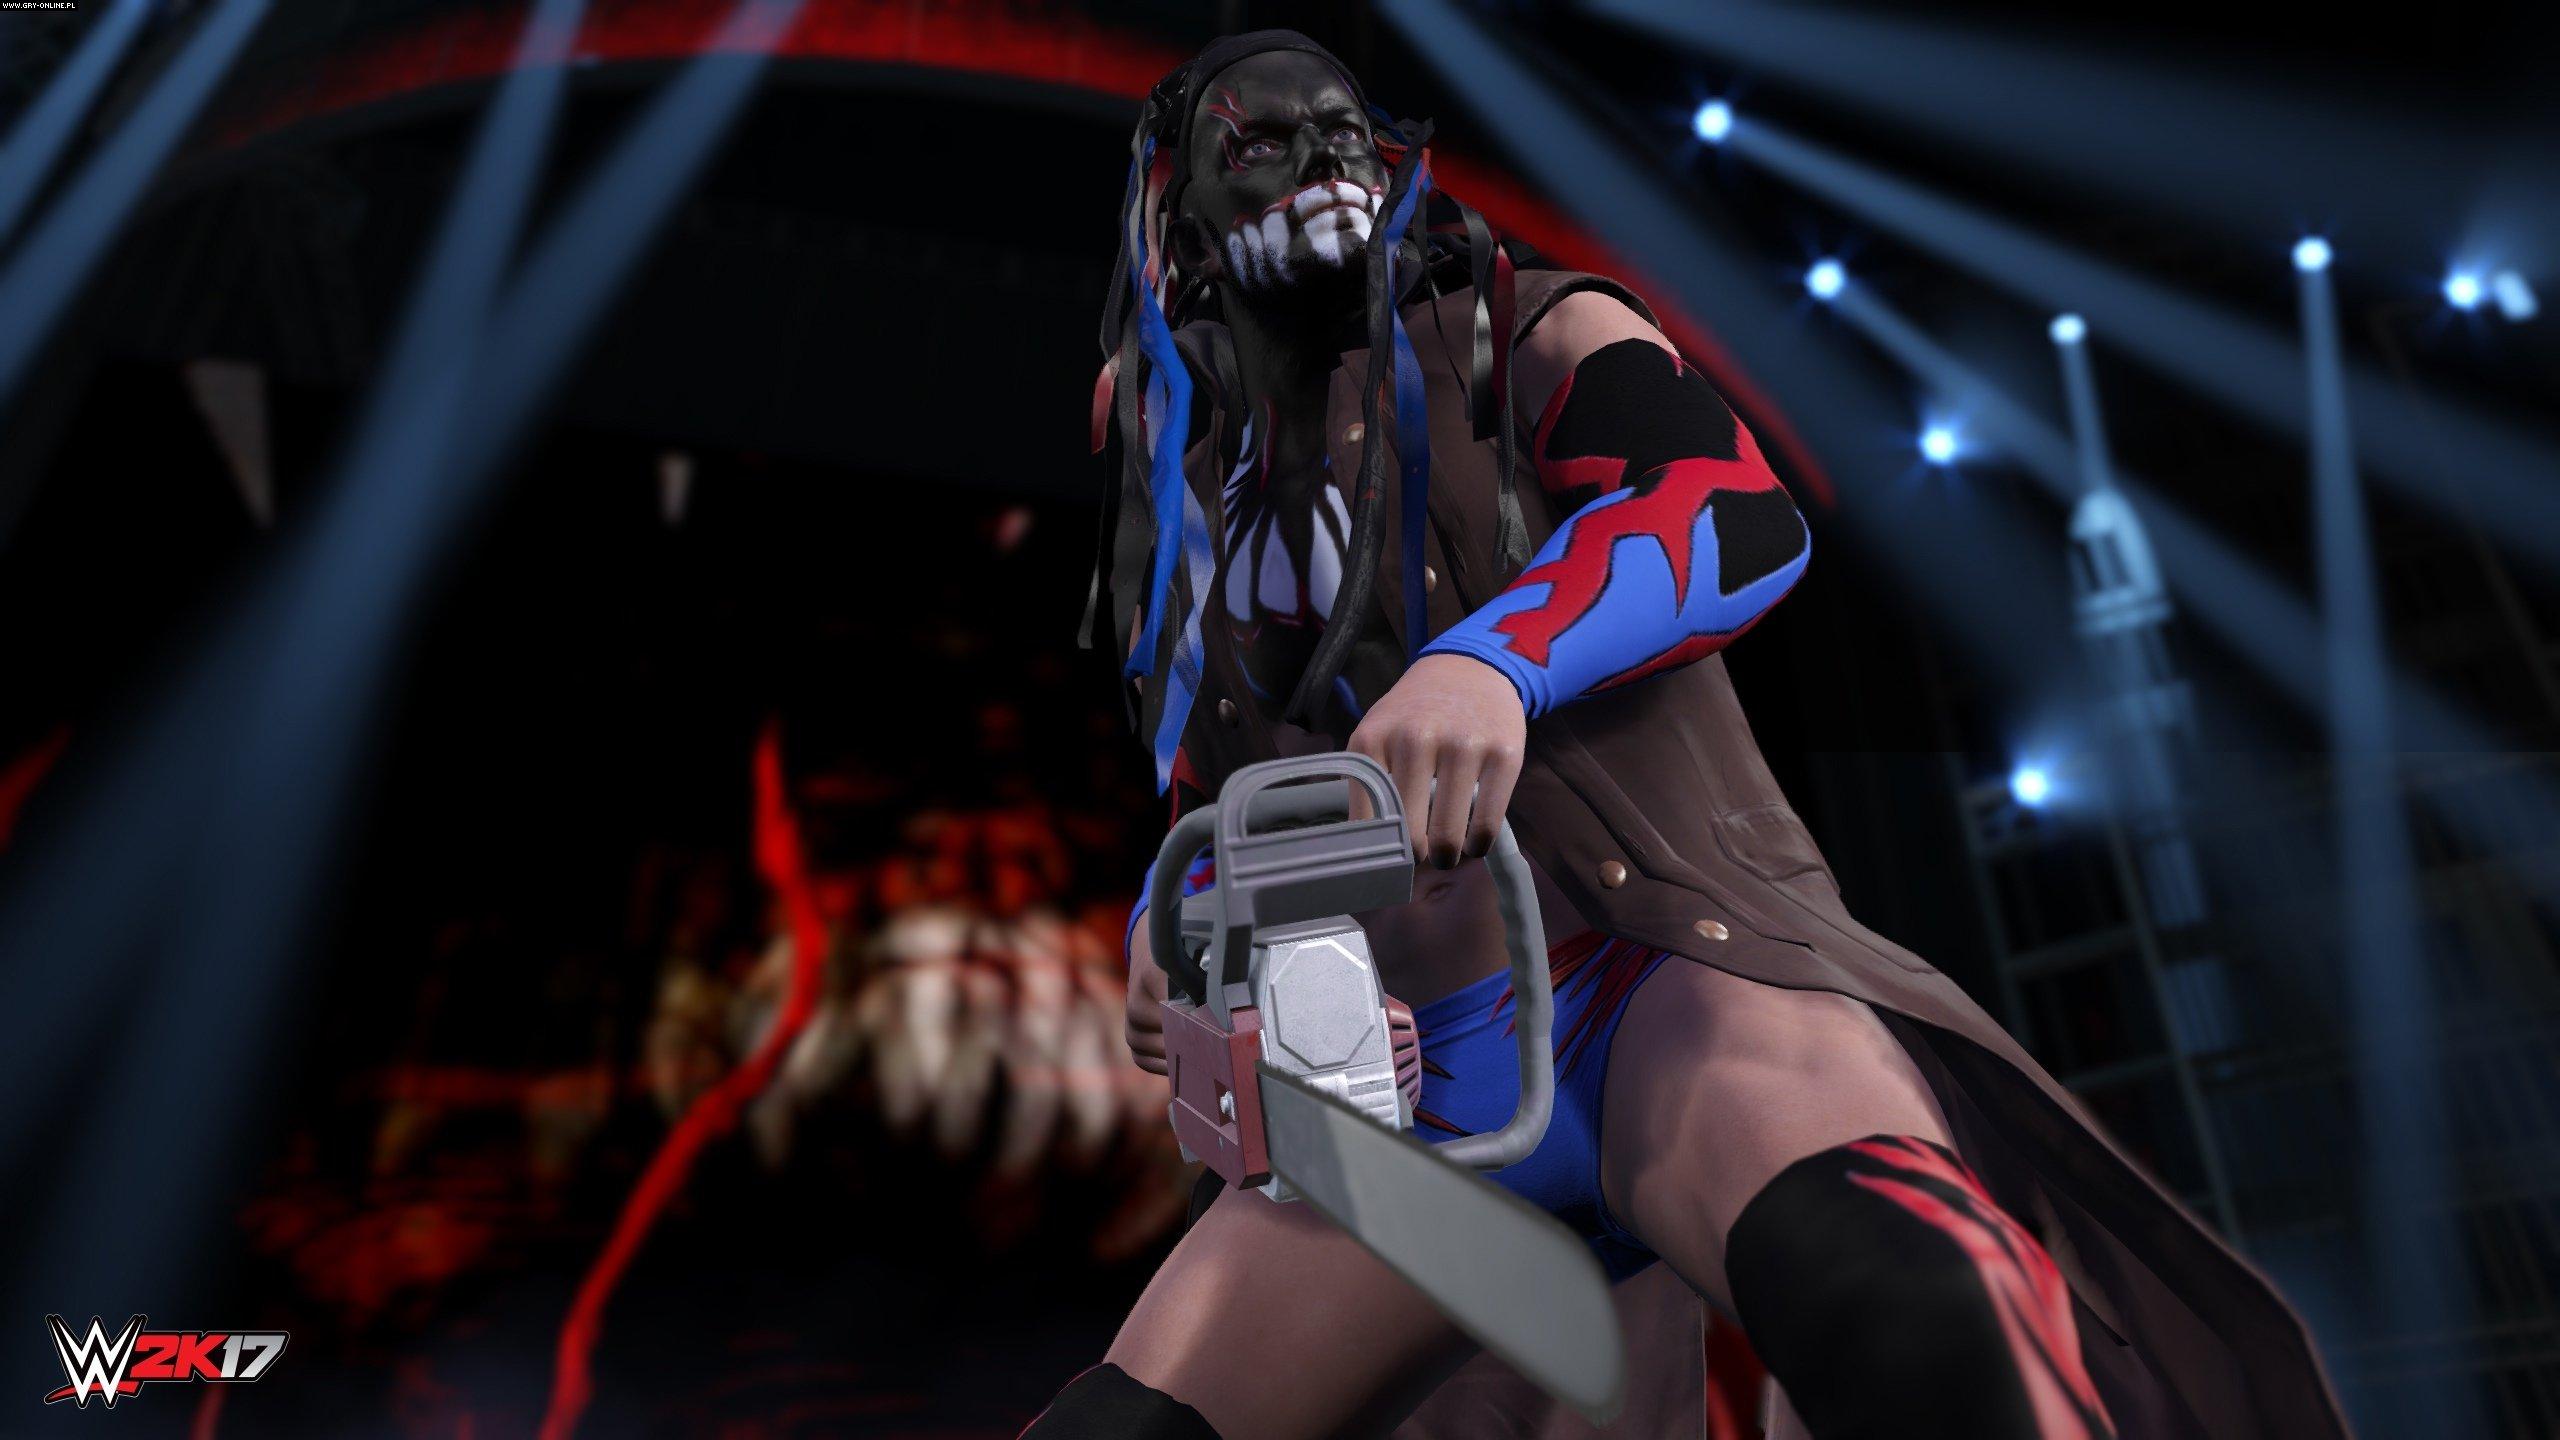 WWE 2K17 PS4, XONE, X360, PS3 Games Image 10/18, Yuke's, 2K Games